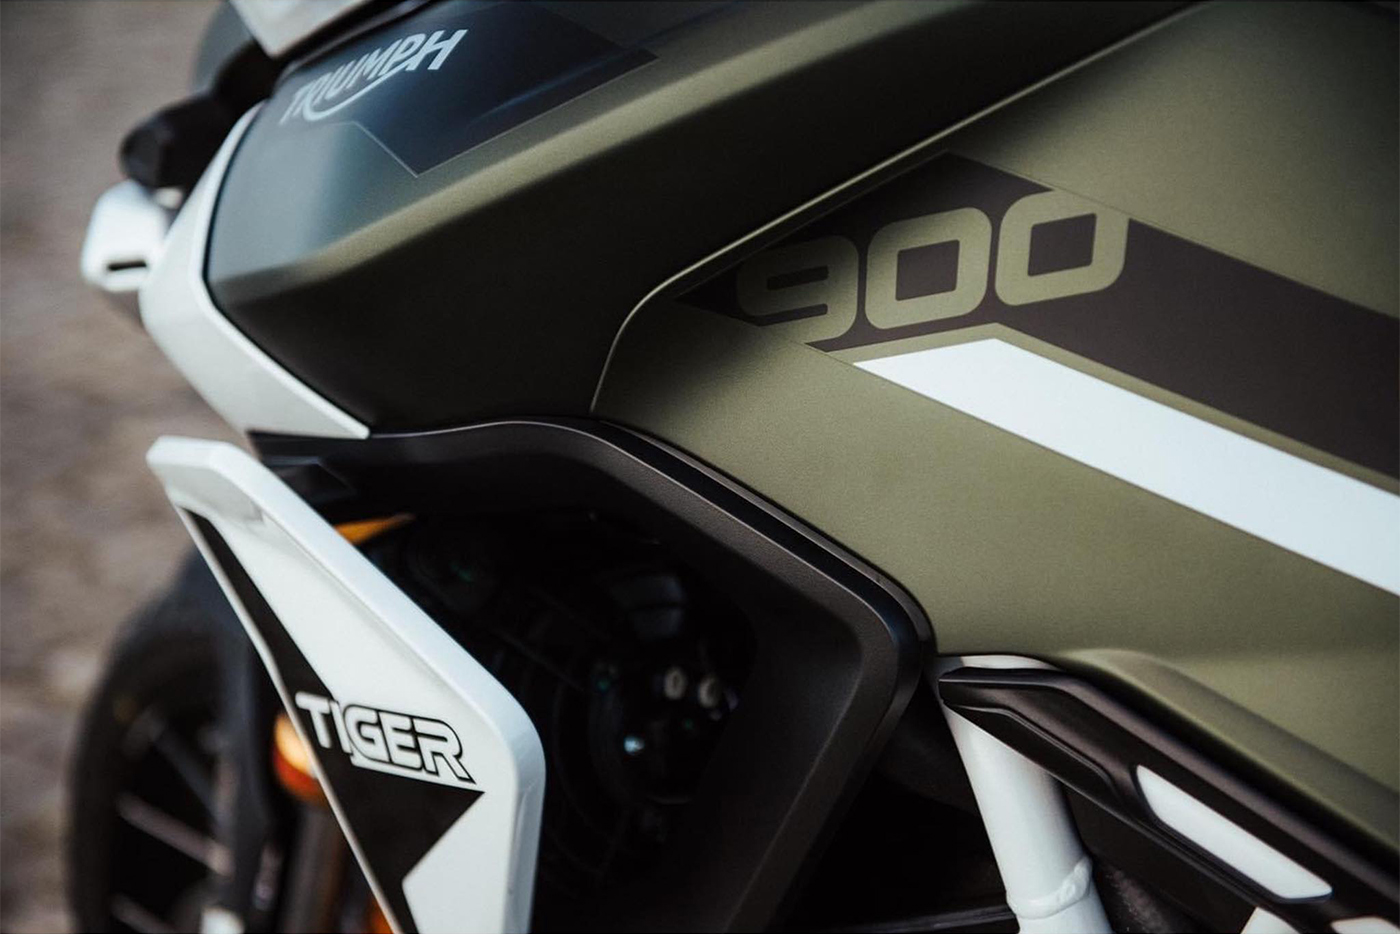 triumph-tiger-900-2020-3.jpg